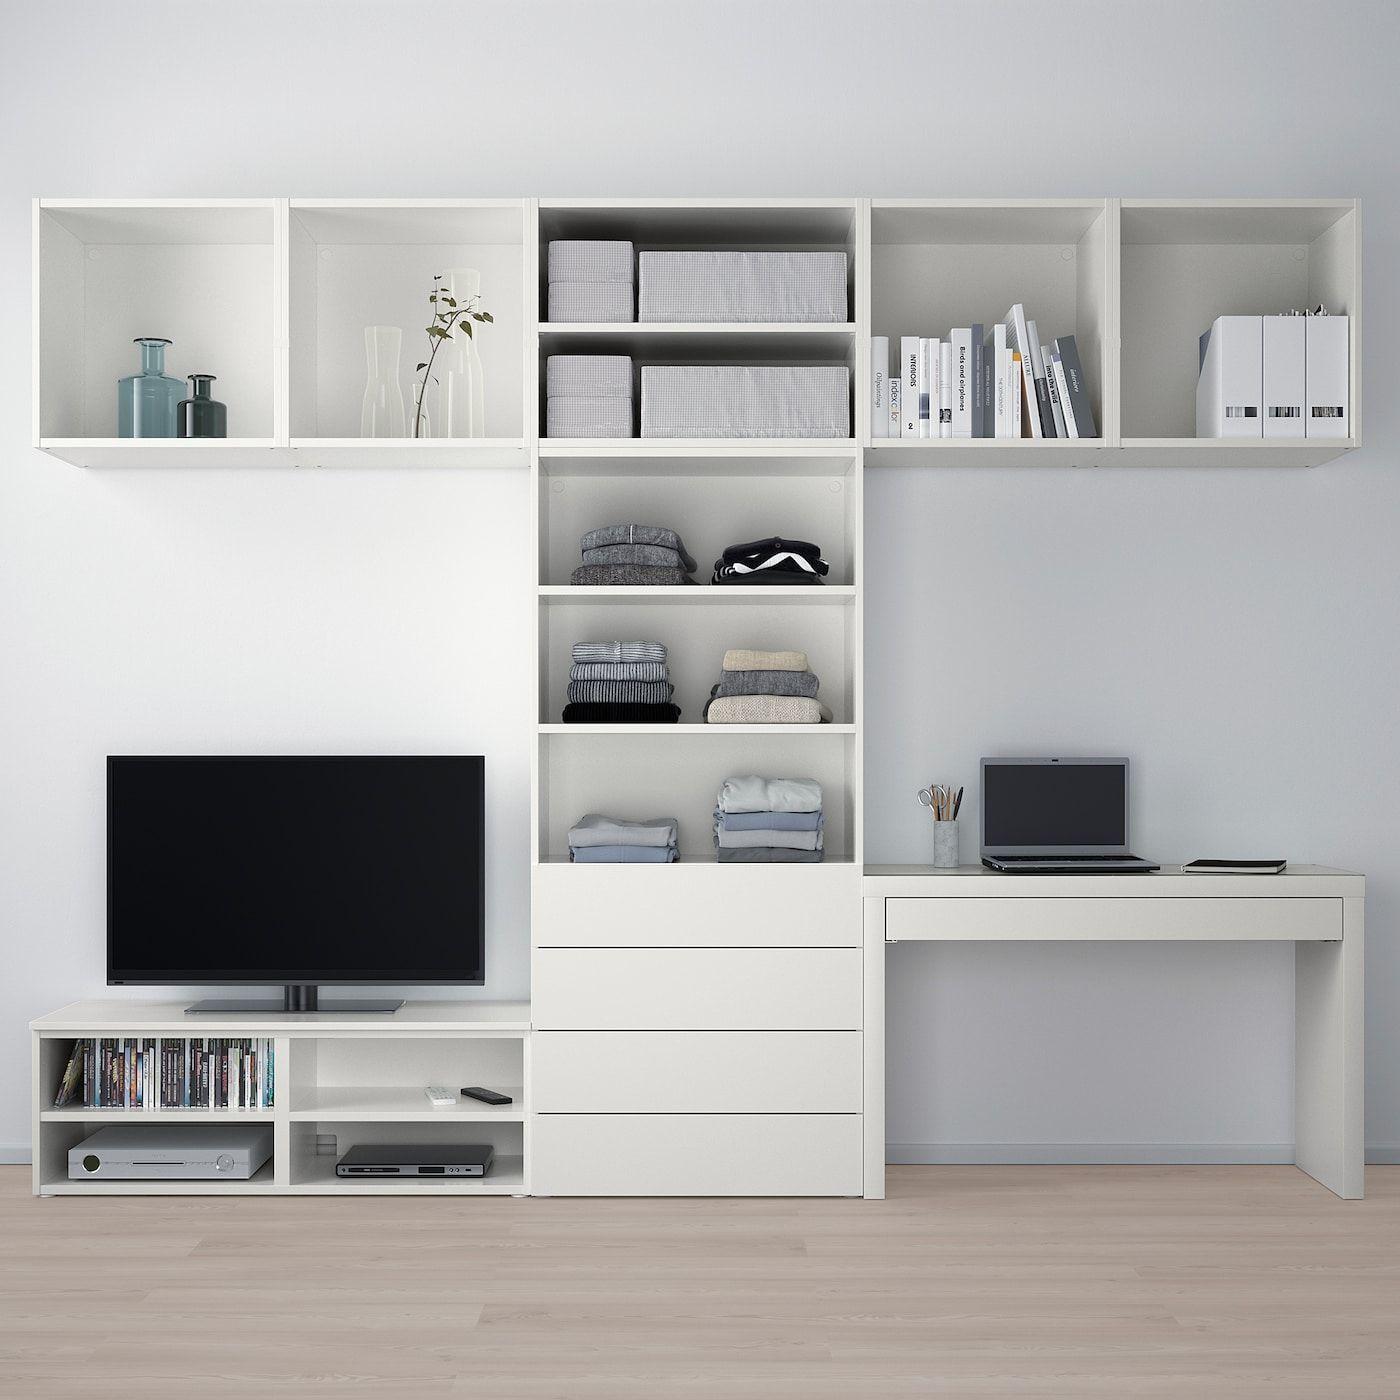 Platsa Objednajte Si Este Dnes Uloz Kombinacia Media Ikea In 2020 Media Storage Ikea Ikea Tv